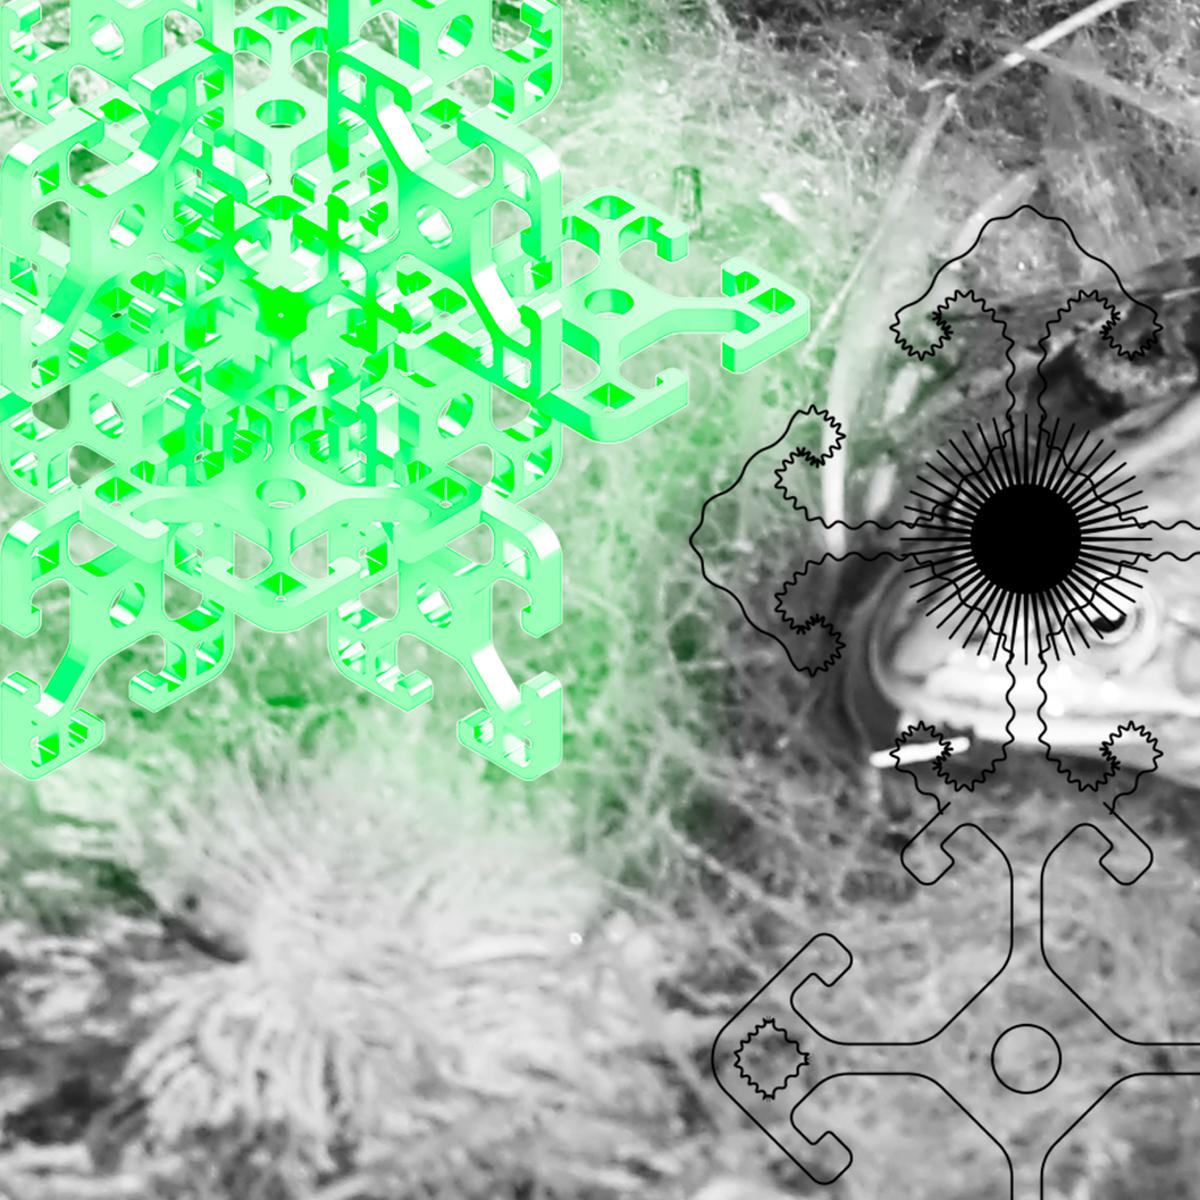 Jonáš Gruska imagines alien ceremonial music on new album Žaburina